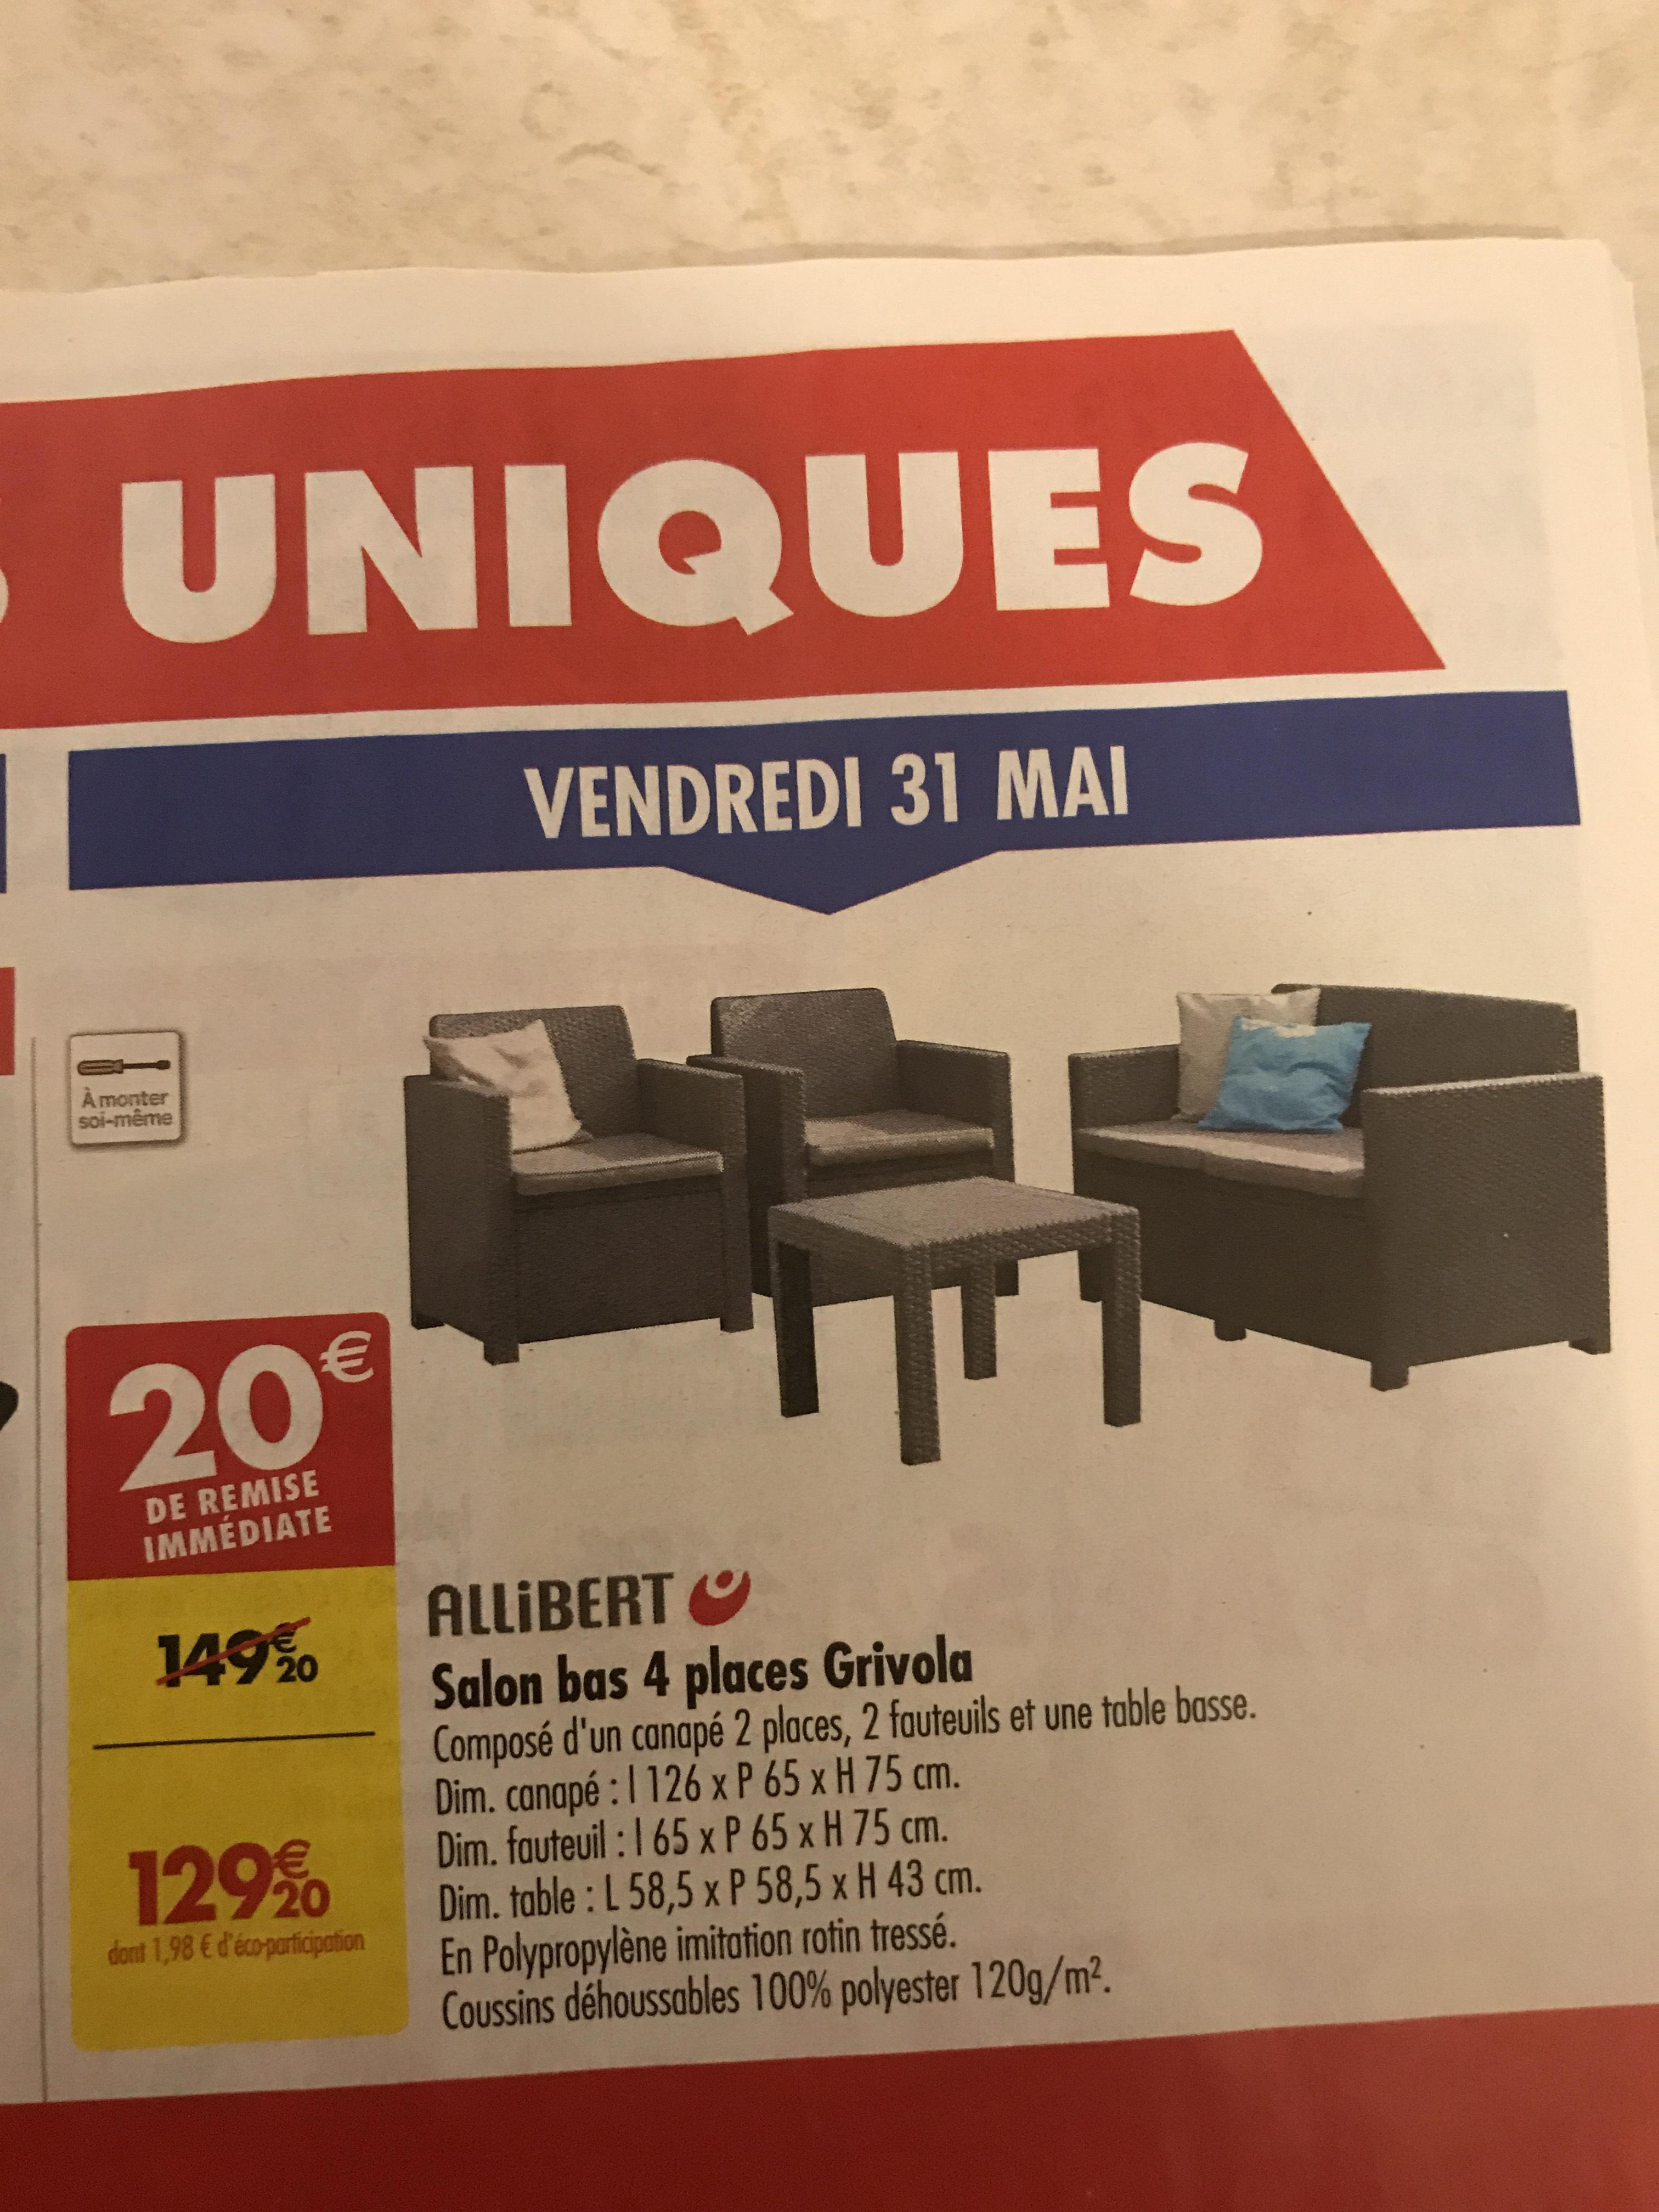 Salon de Allibert Grivola - 4 Places – Dealabs.com